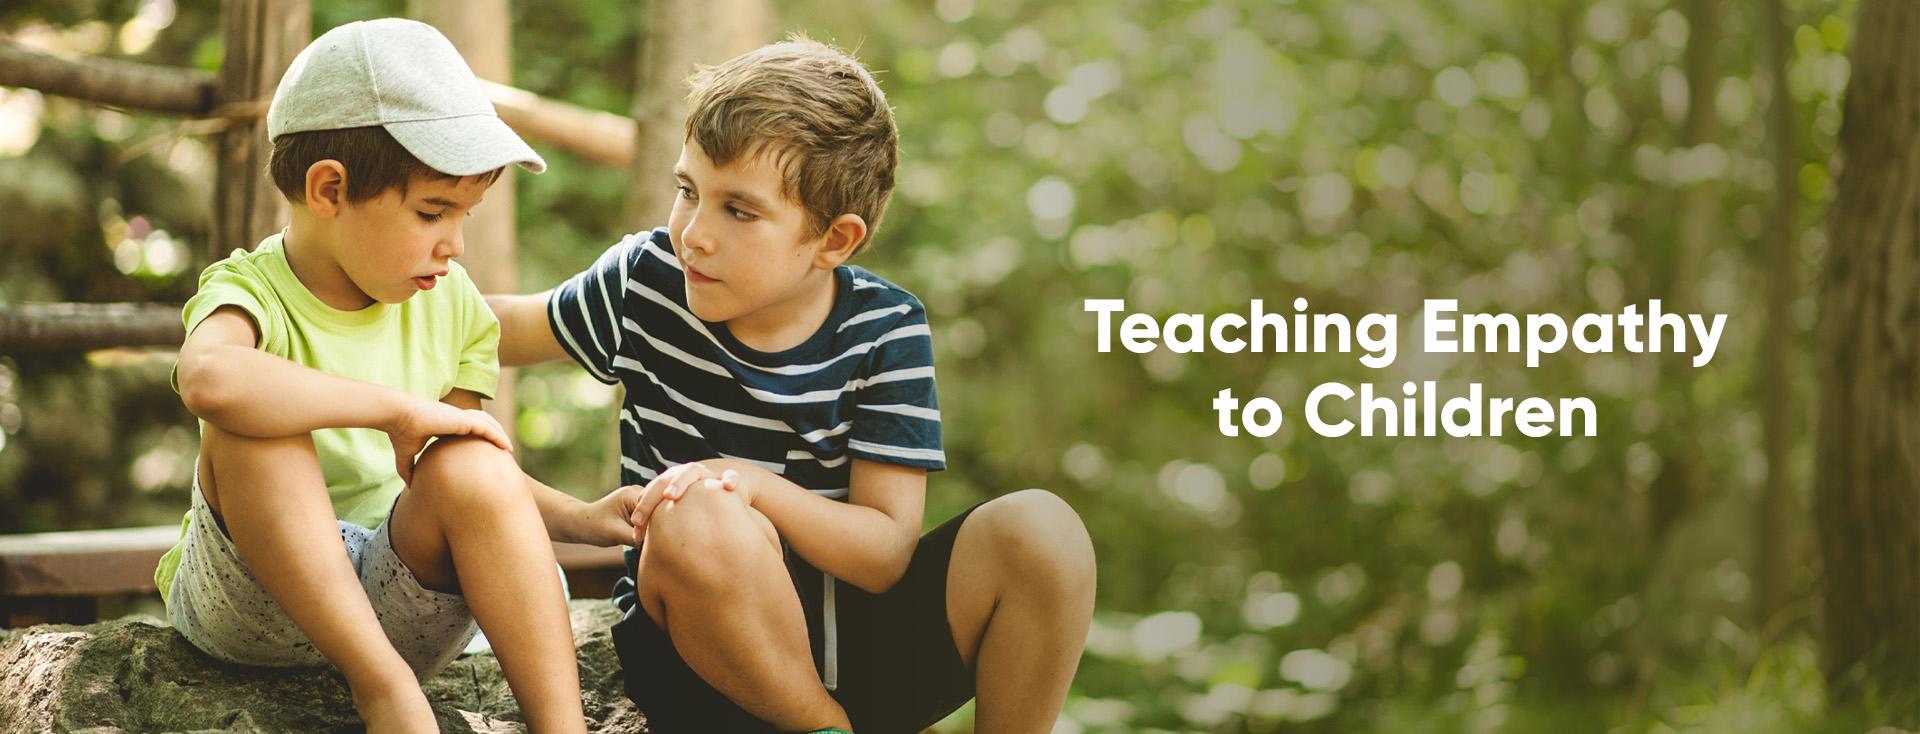 Teaching Empathy to Children